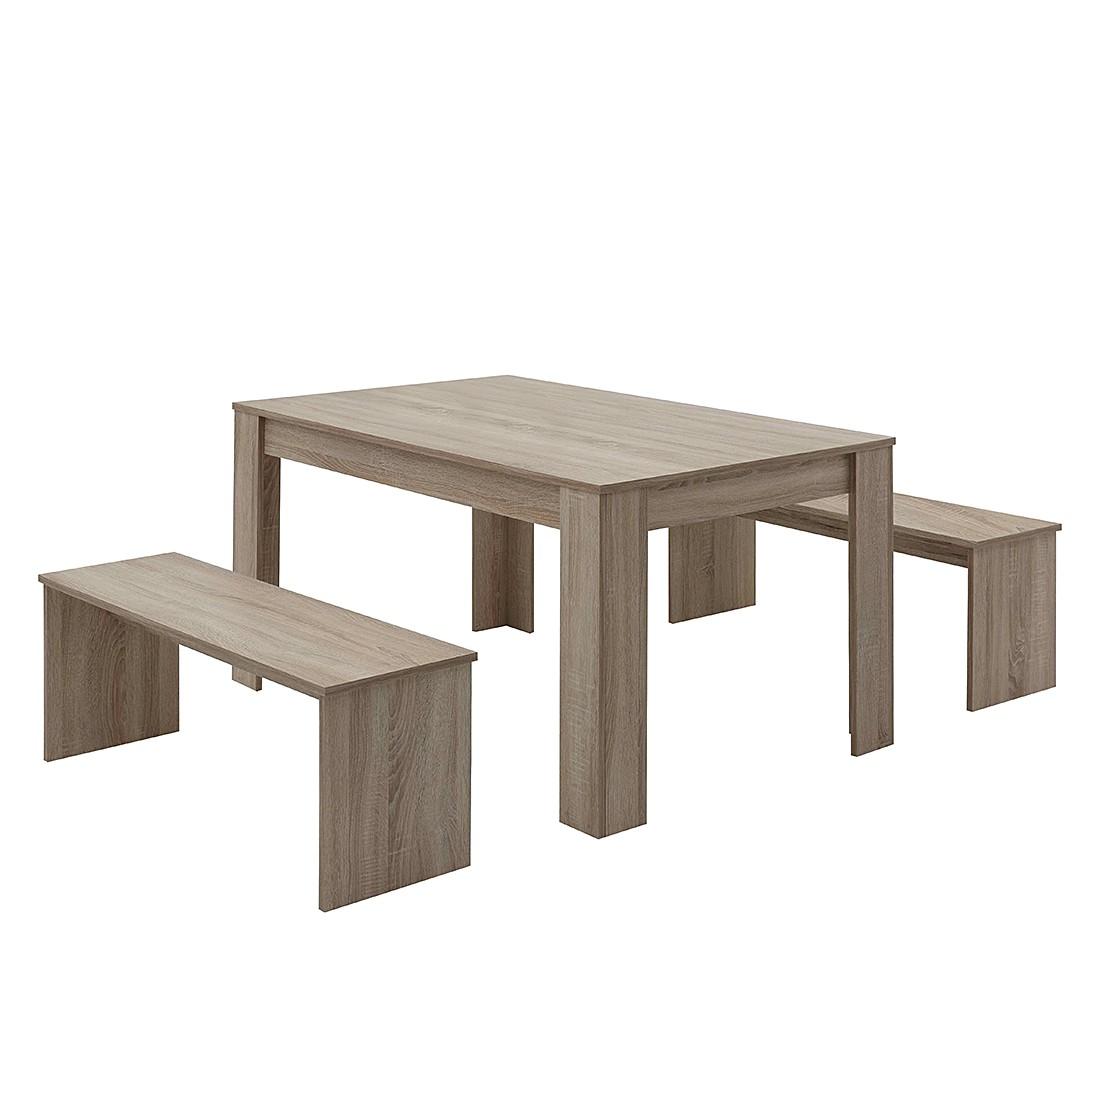 essgruppe mit bank g nstig kaufen. Black Bedroom Furniture Sets. Home Design Ideas